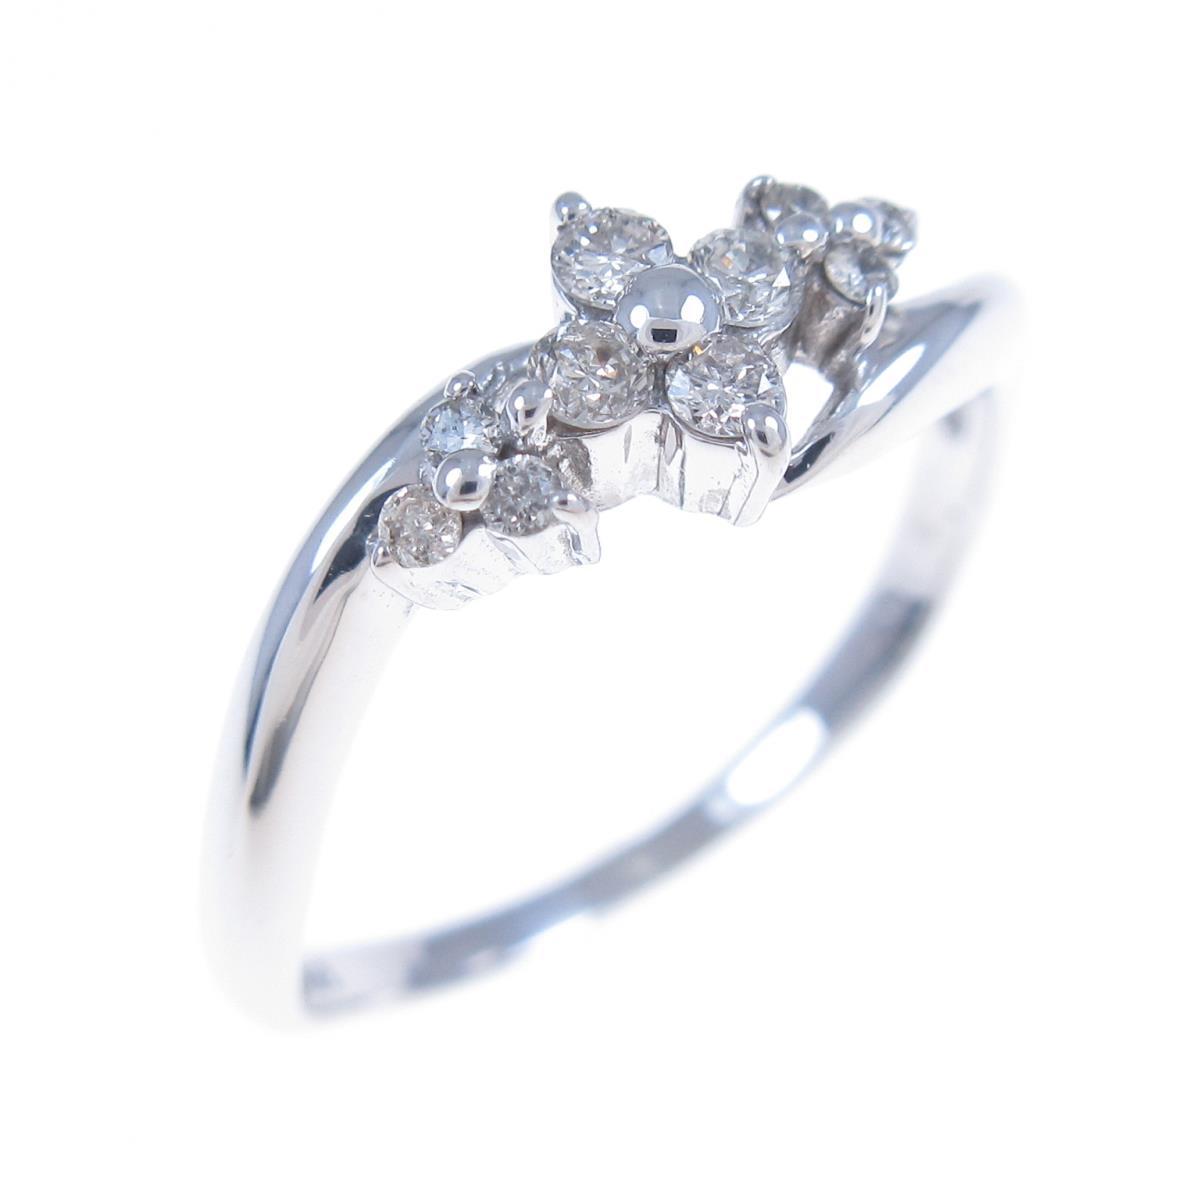 K18WG フラワー ダイヤモンドリング【中古】